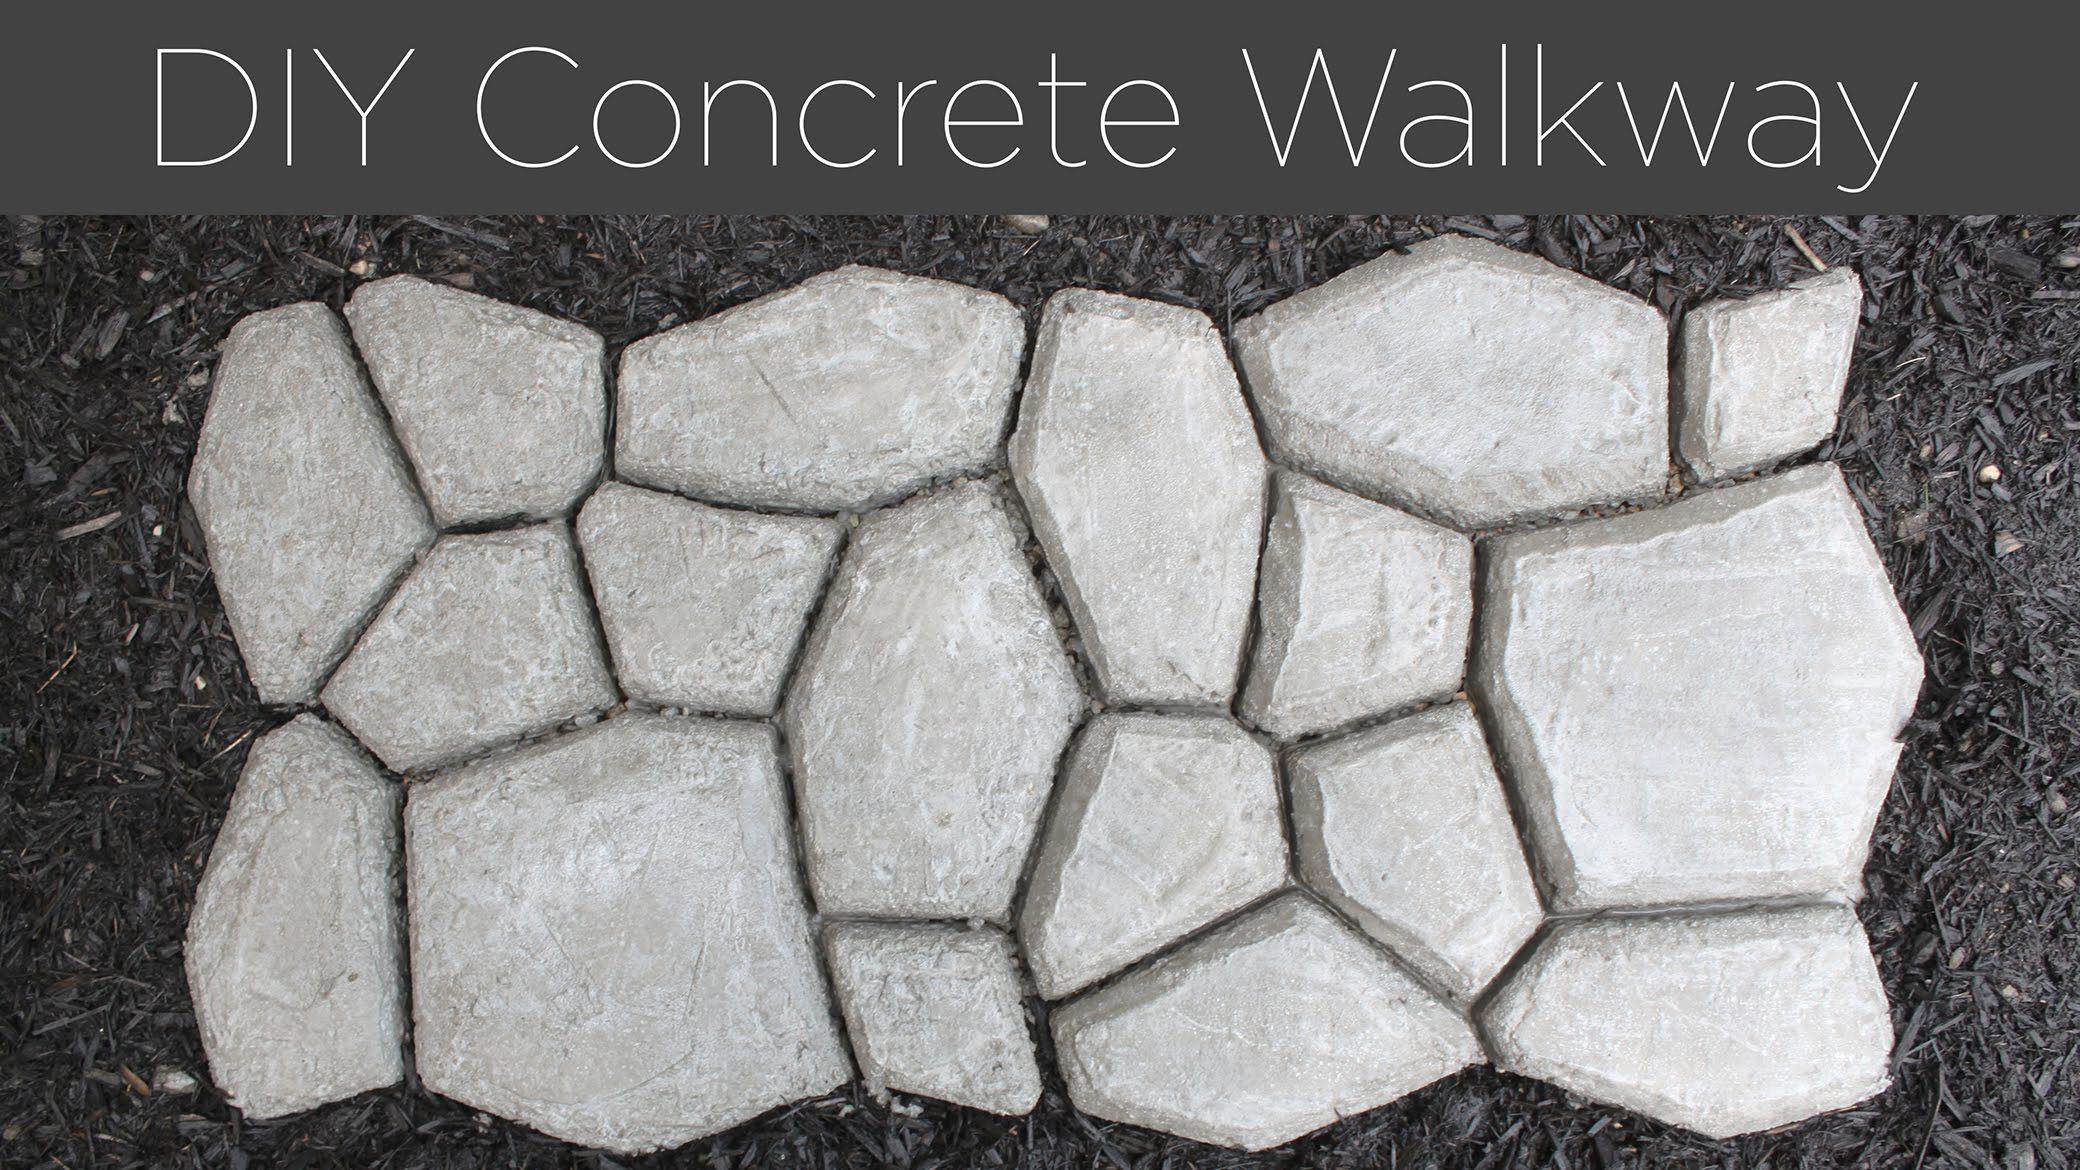 DIY Concrete Walkway ガーデン